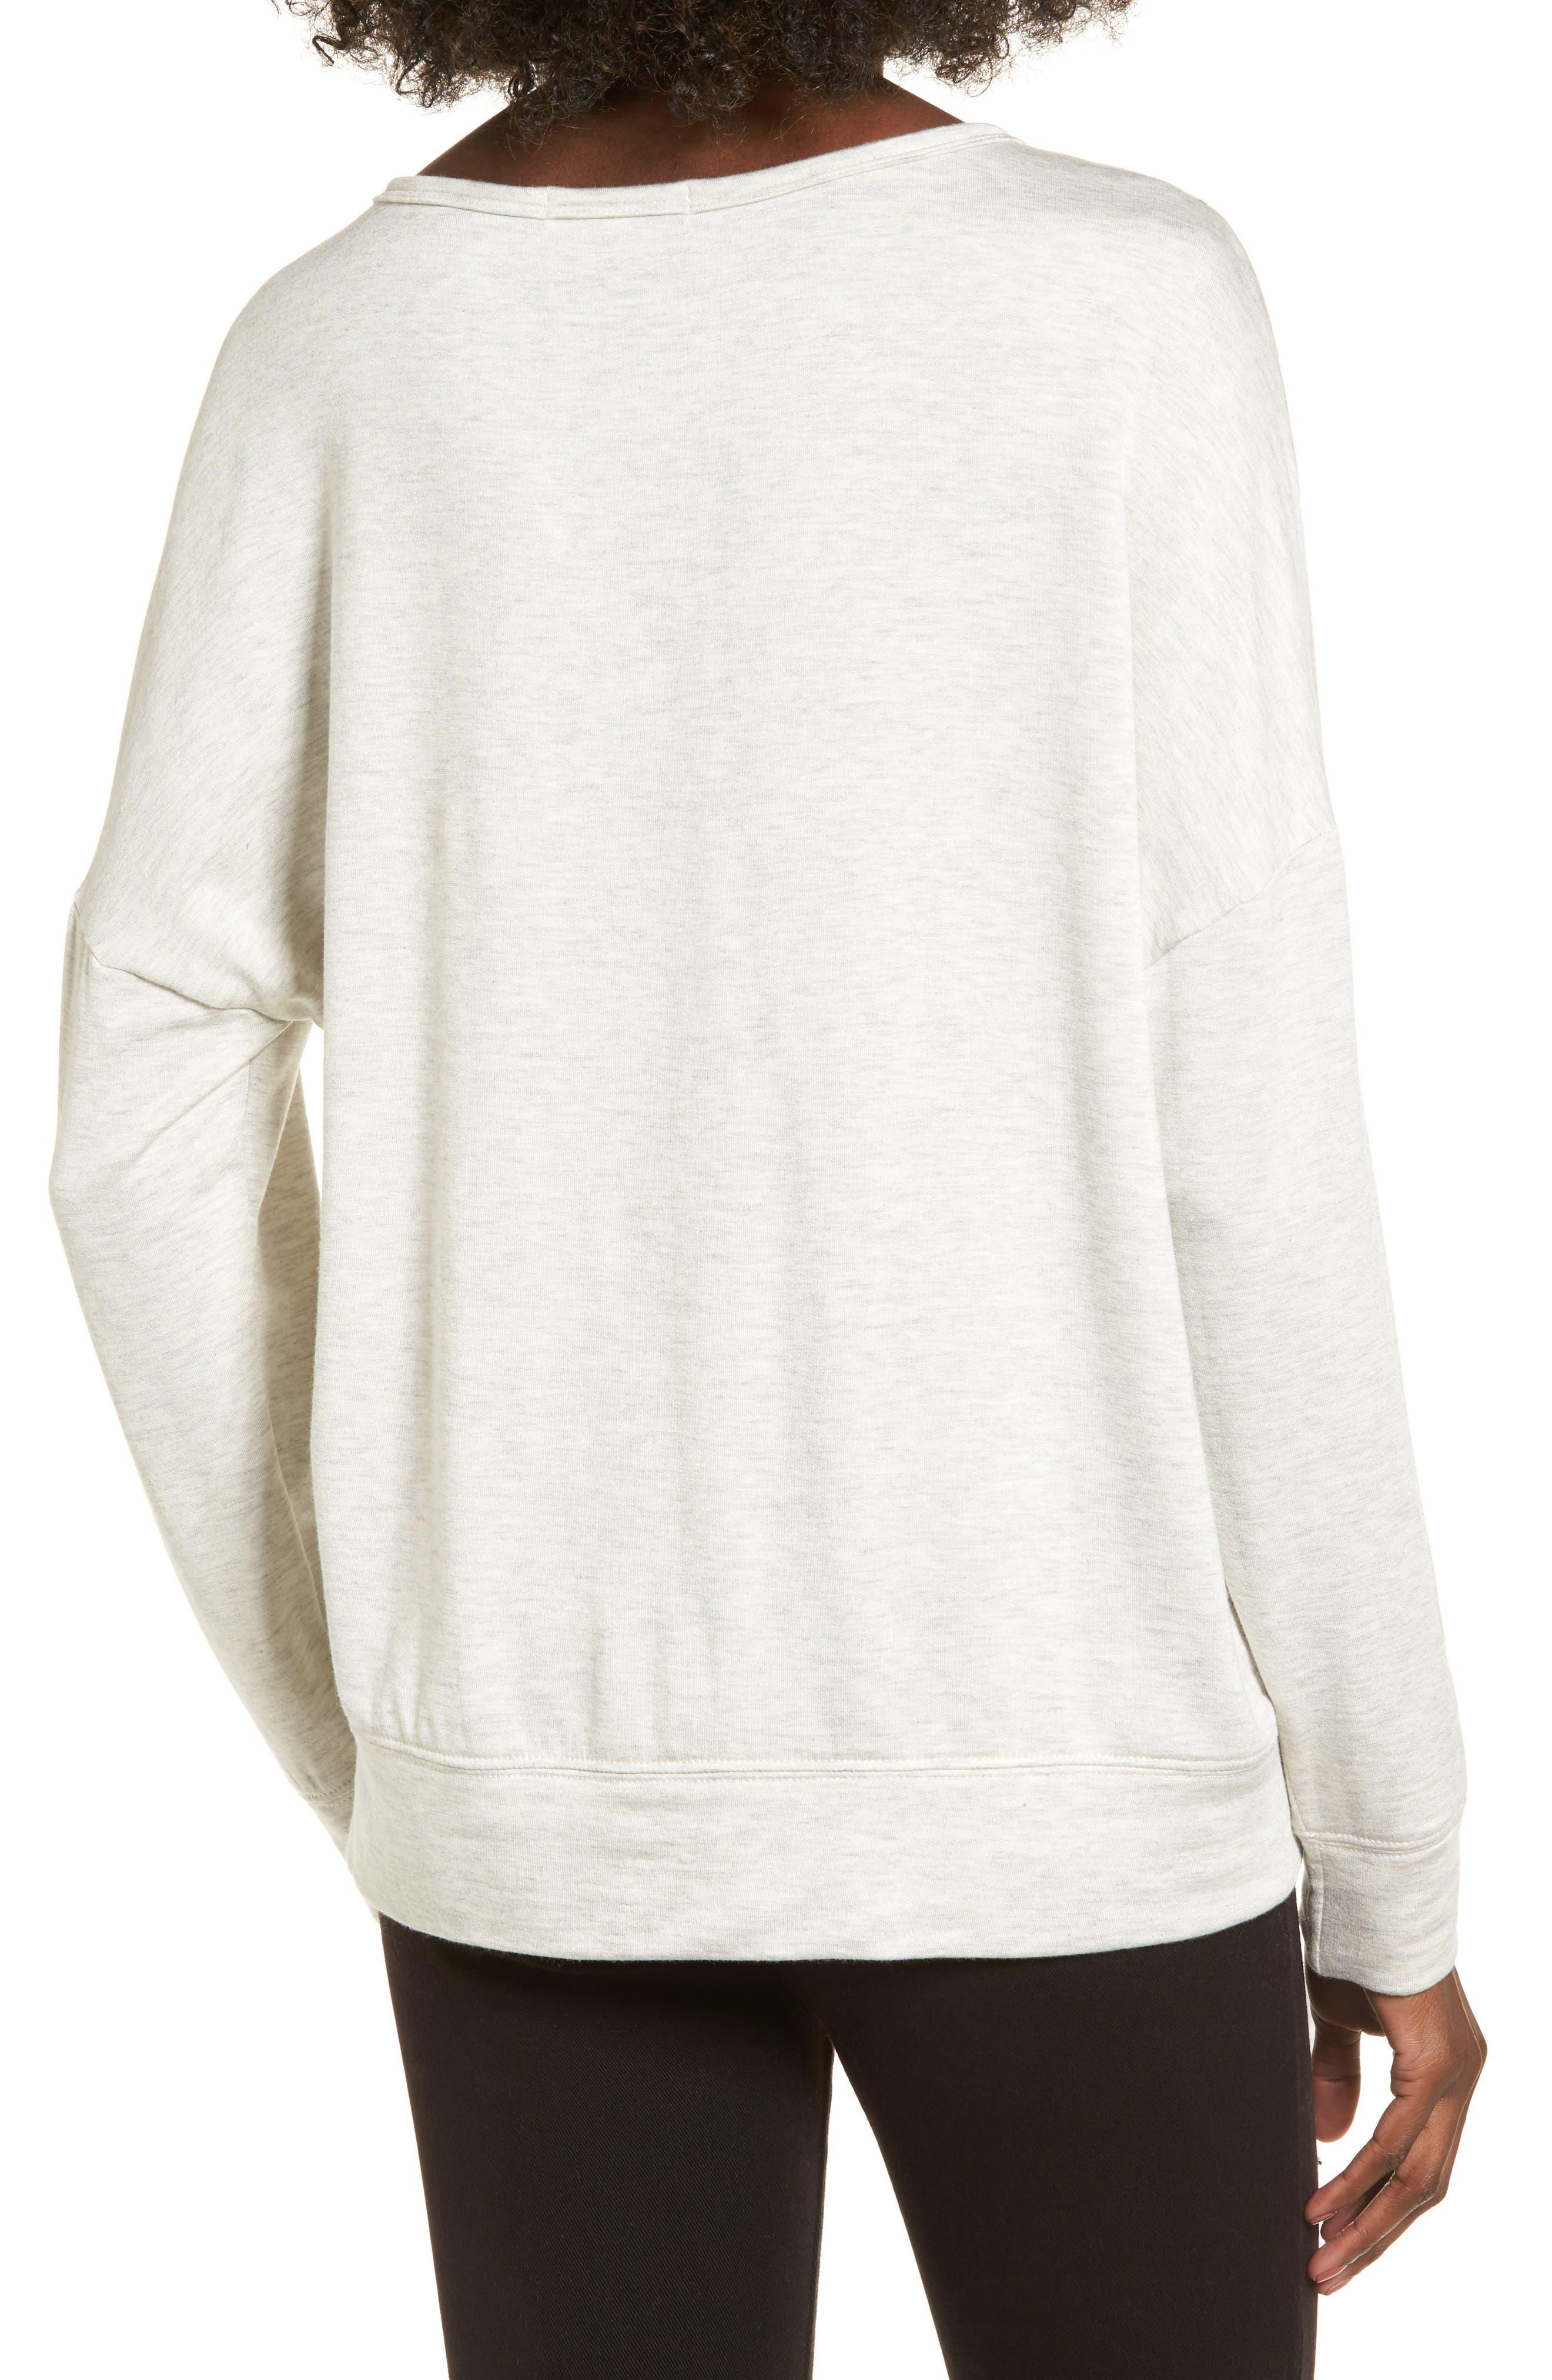 Snake Print Sweatshirt,                             Alternate thumbnail 2, color,                             Light Grey